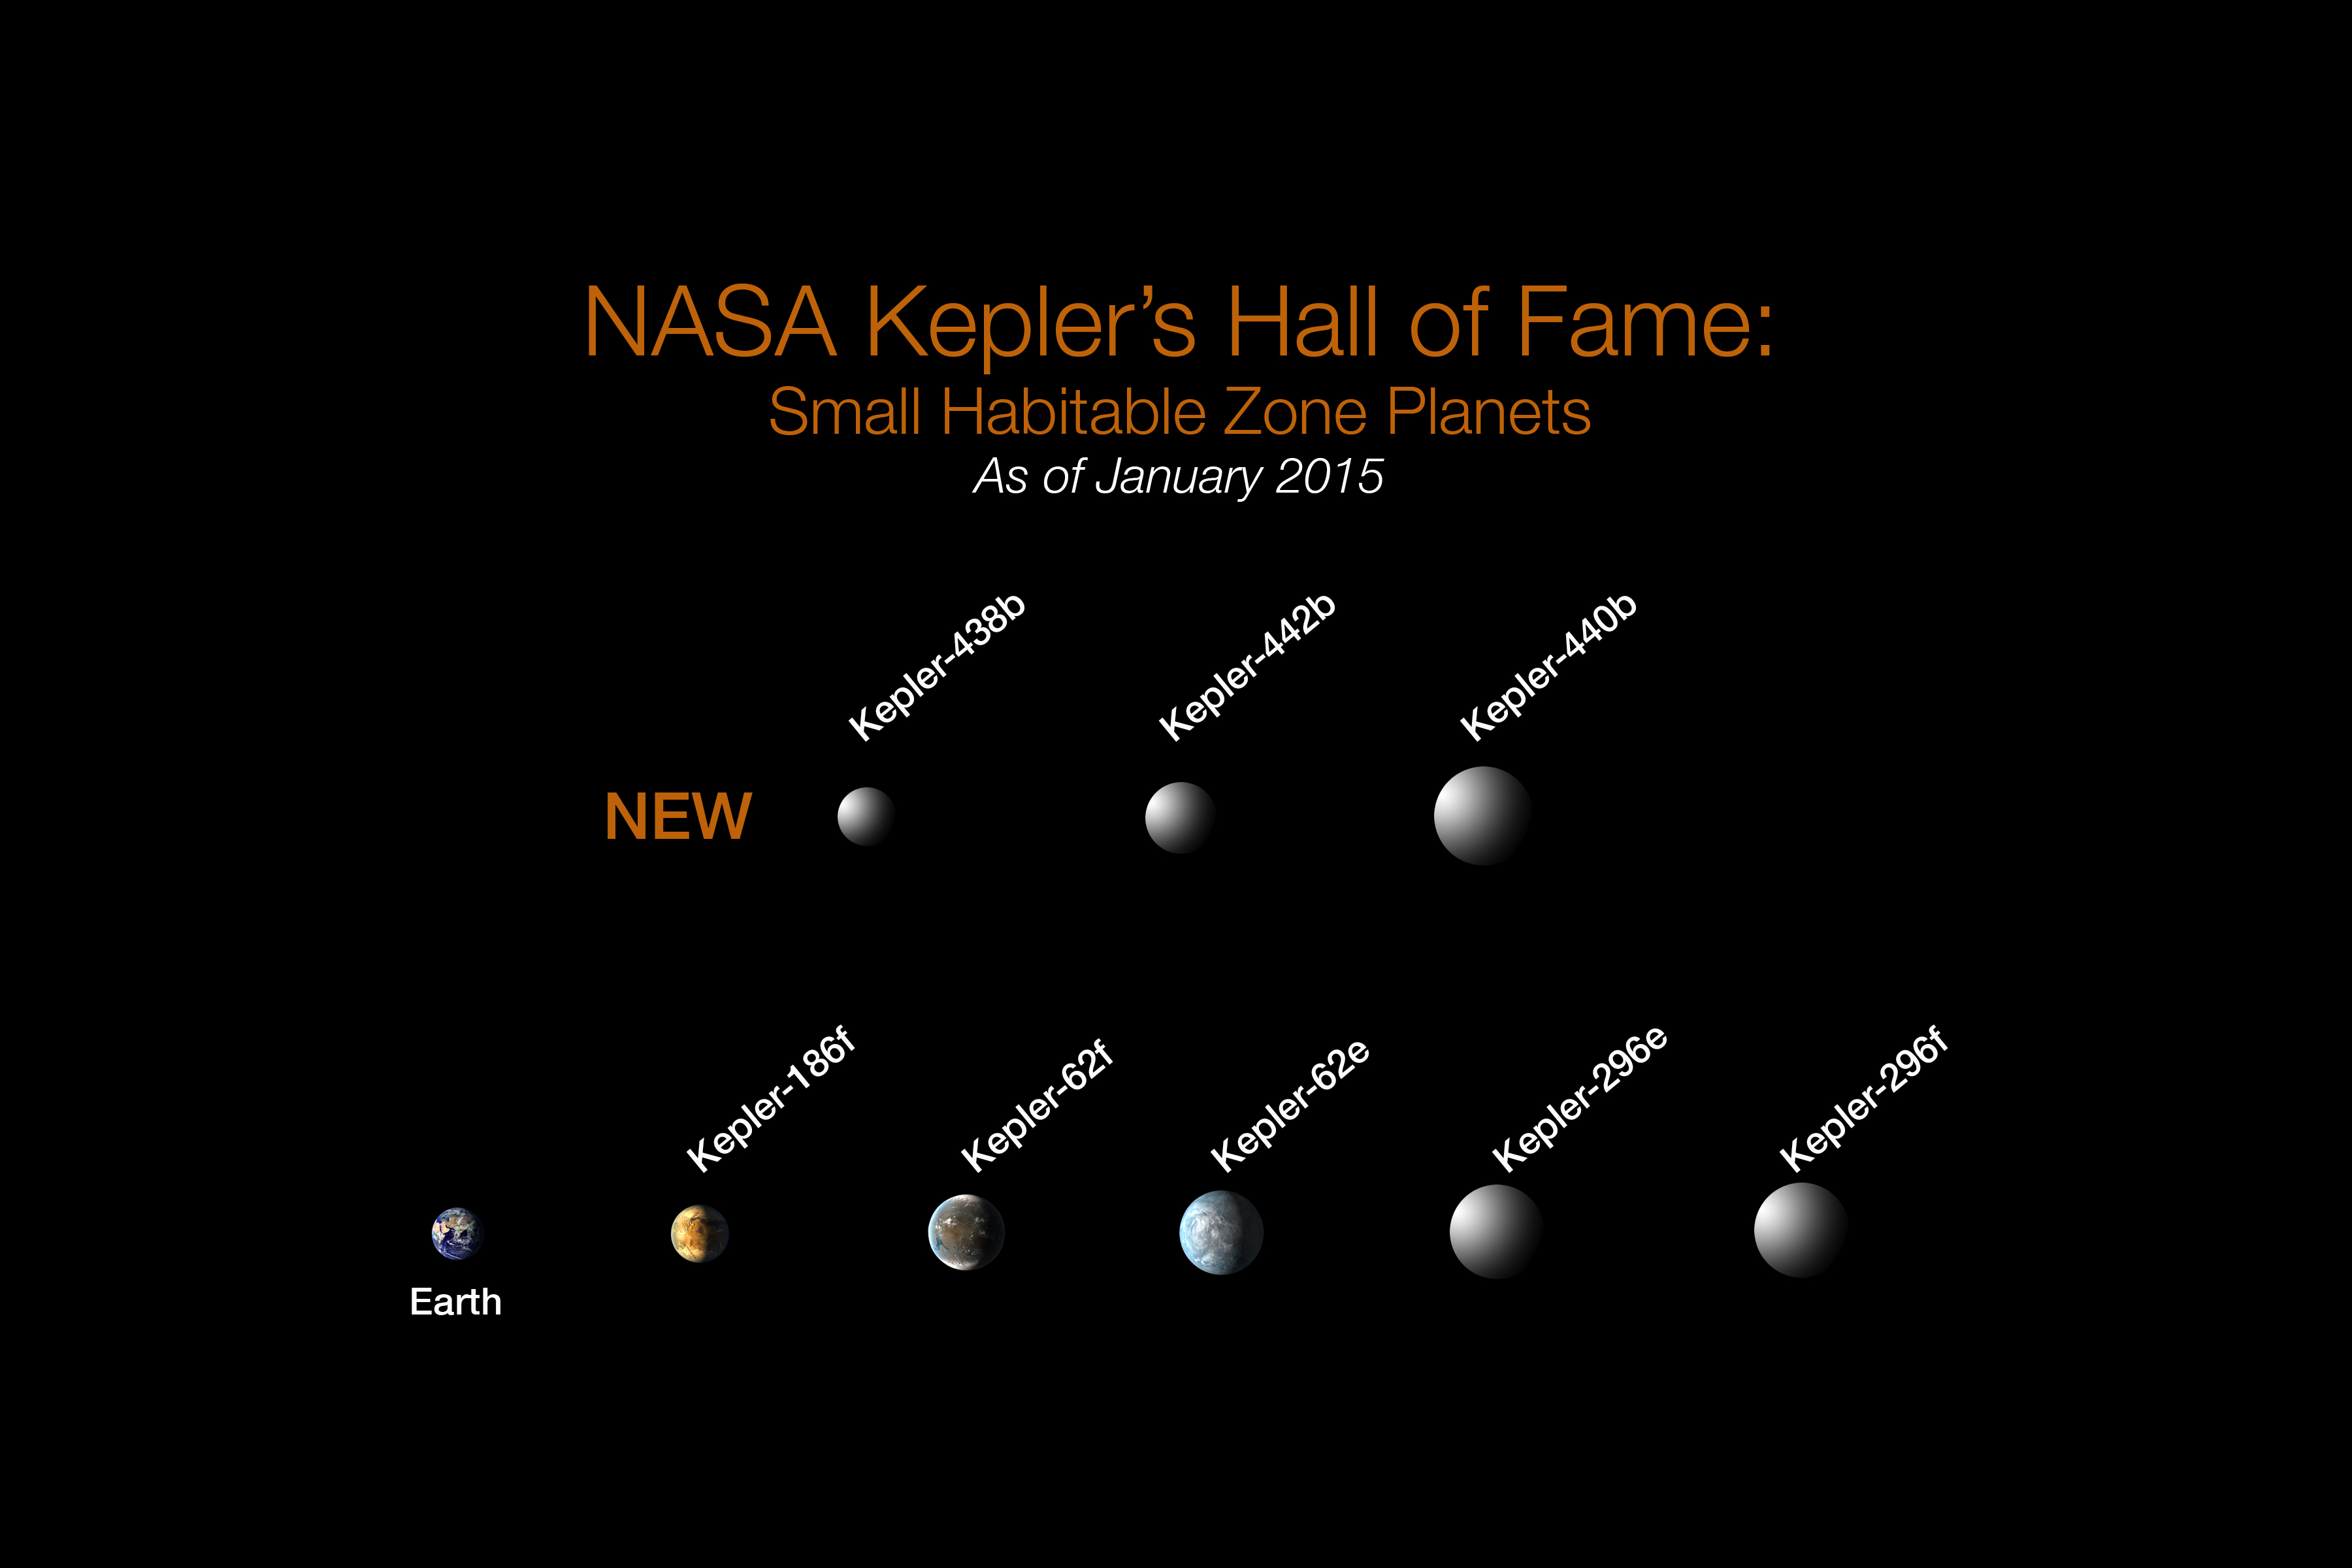 Kepler's 8 small habitable zone planets